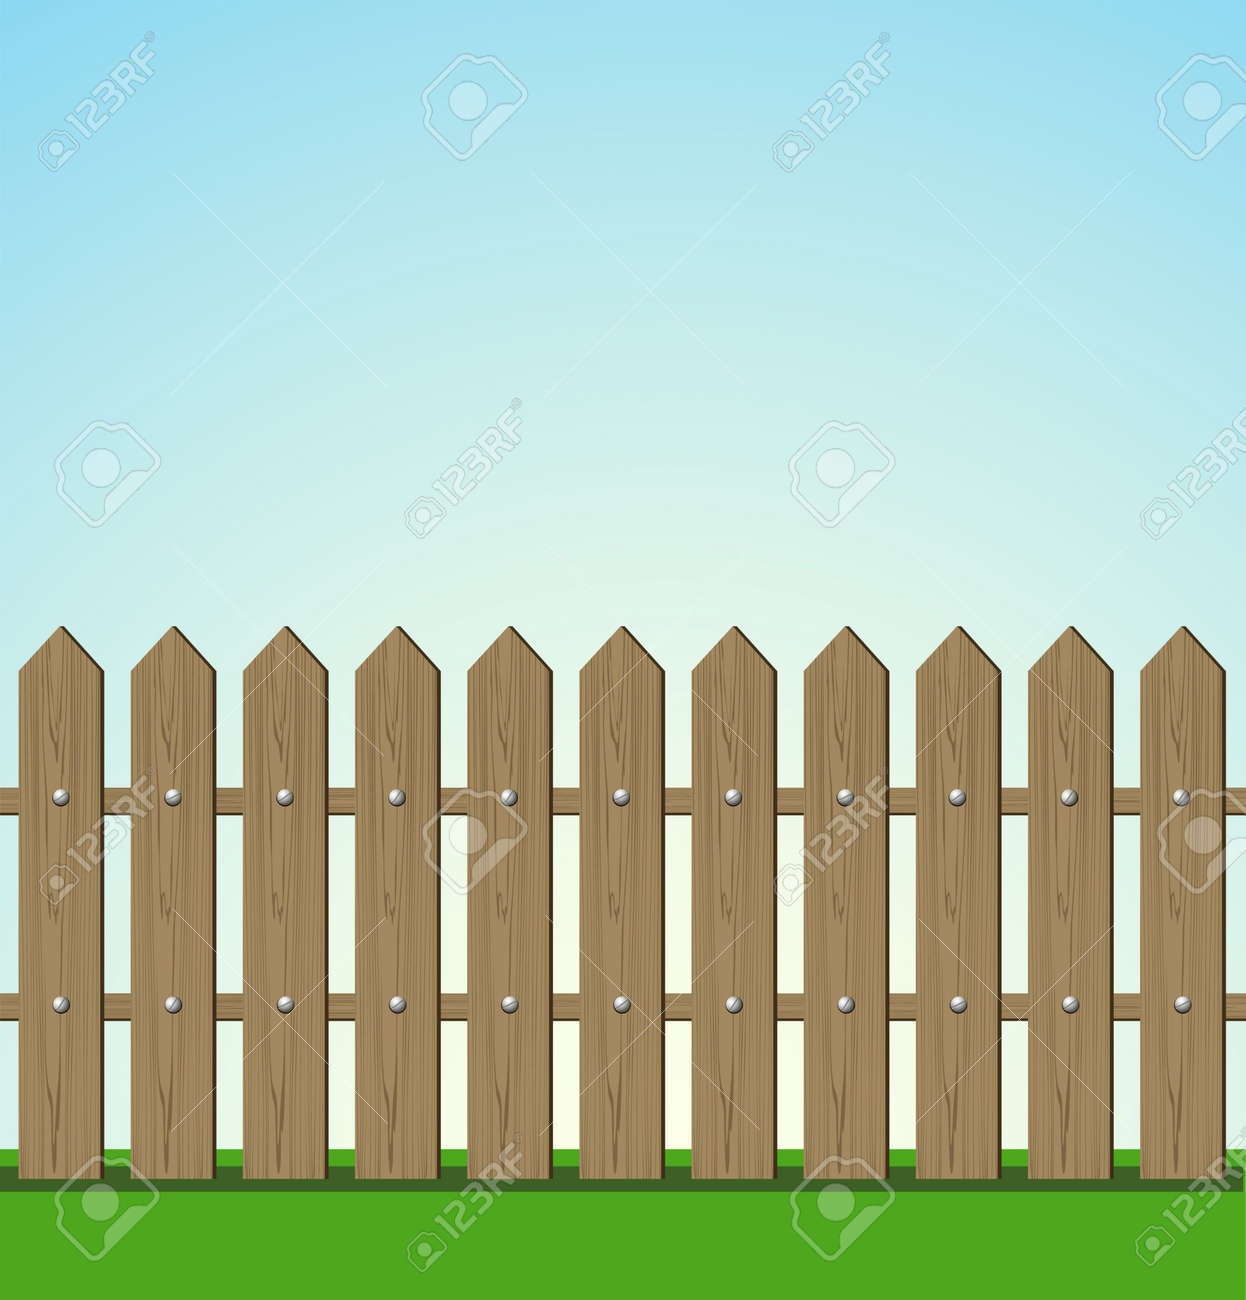 Wooden fence illustration Stock Vector - 15637376